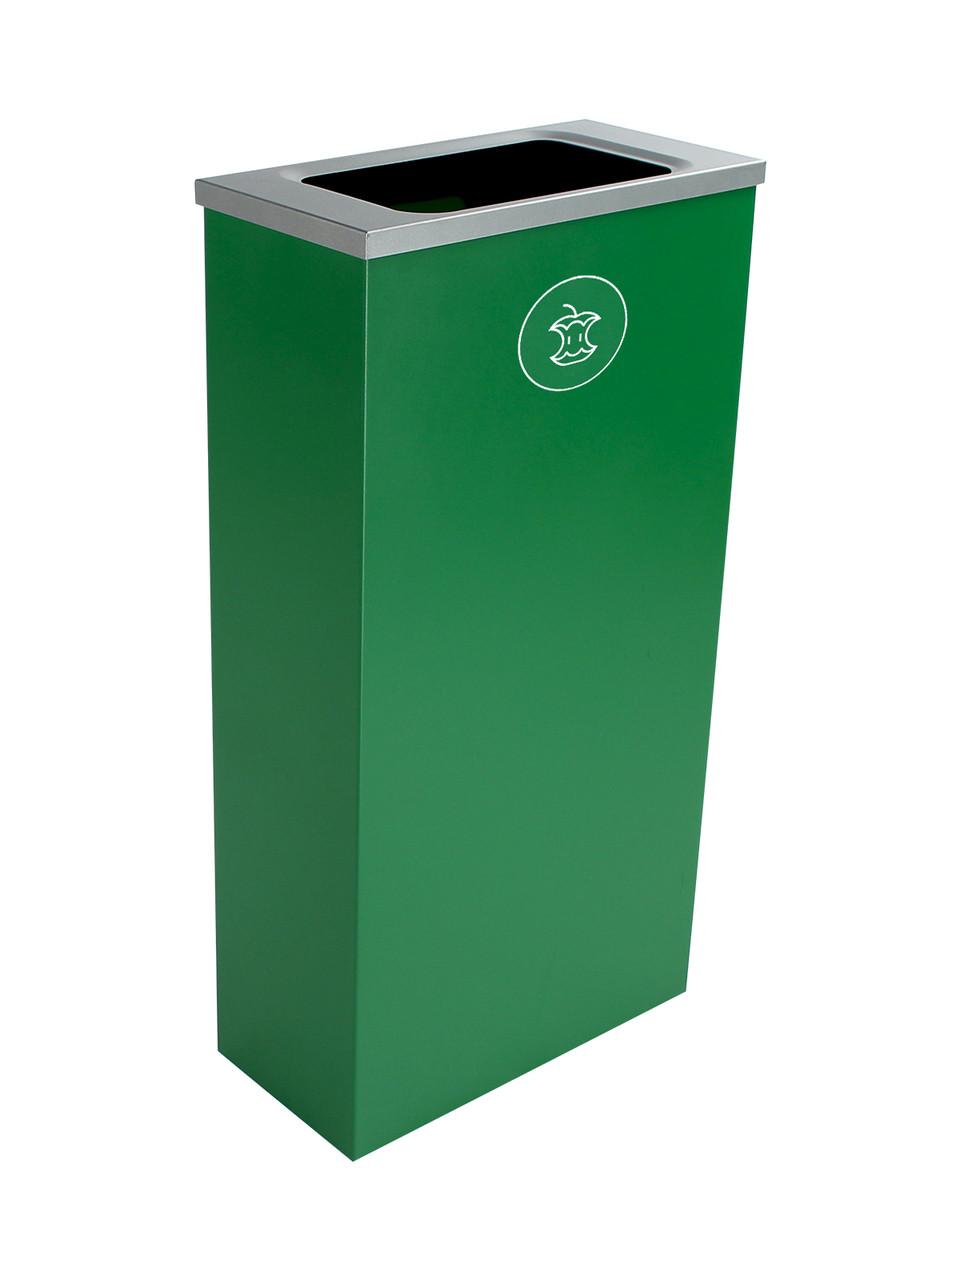 10 Gallon Steel Spectrum Slim Compost Bin Green 8107070-4